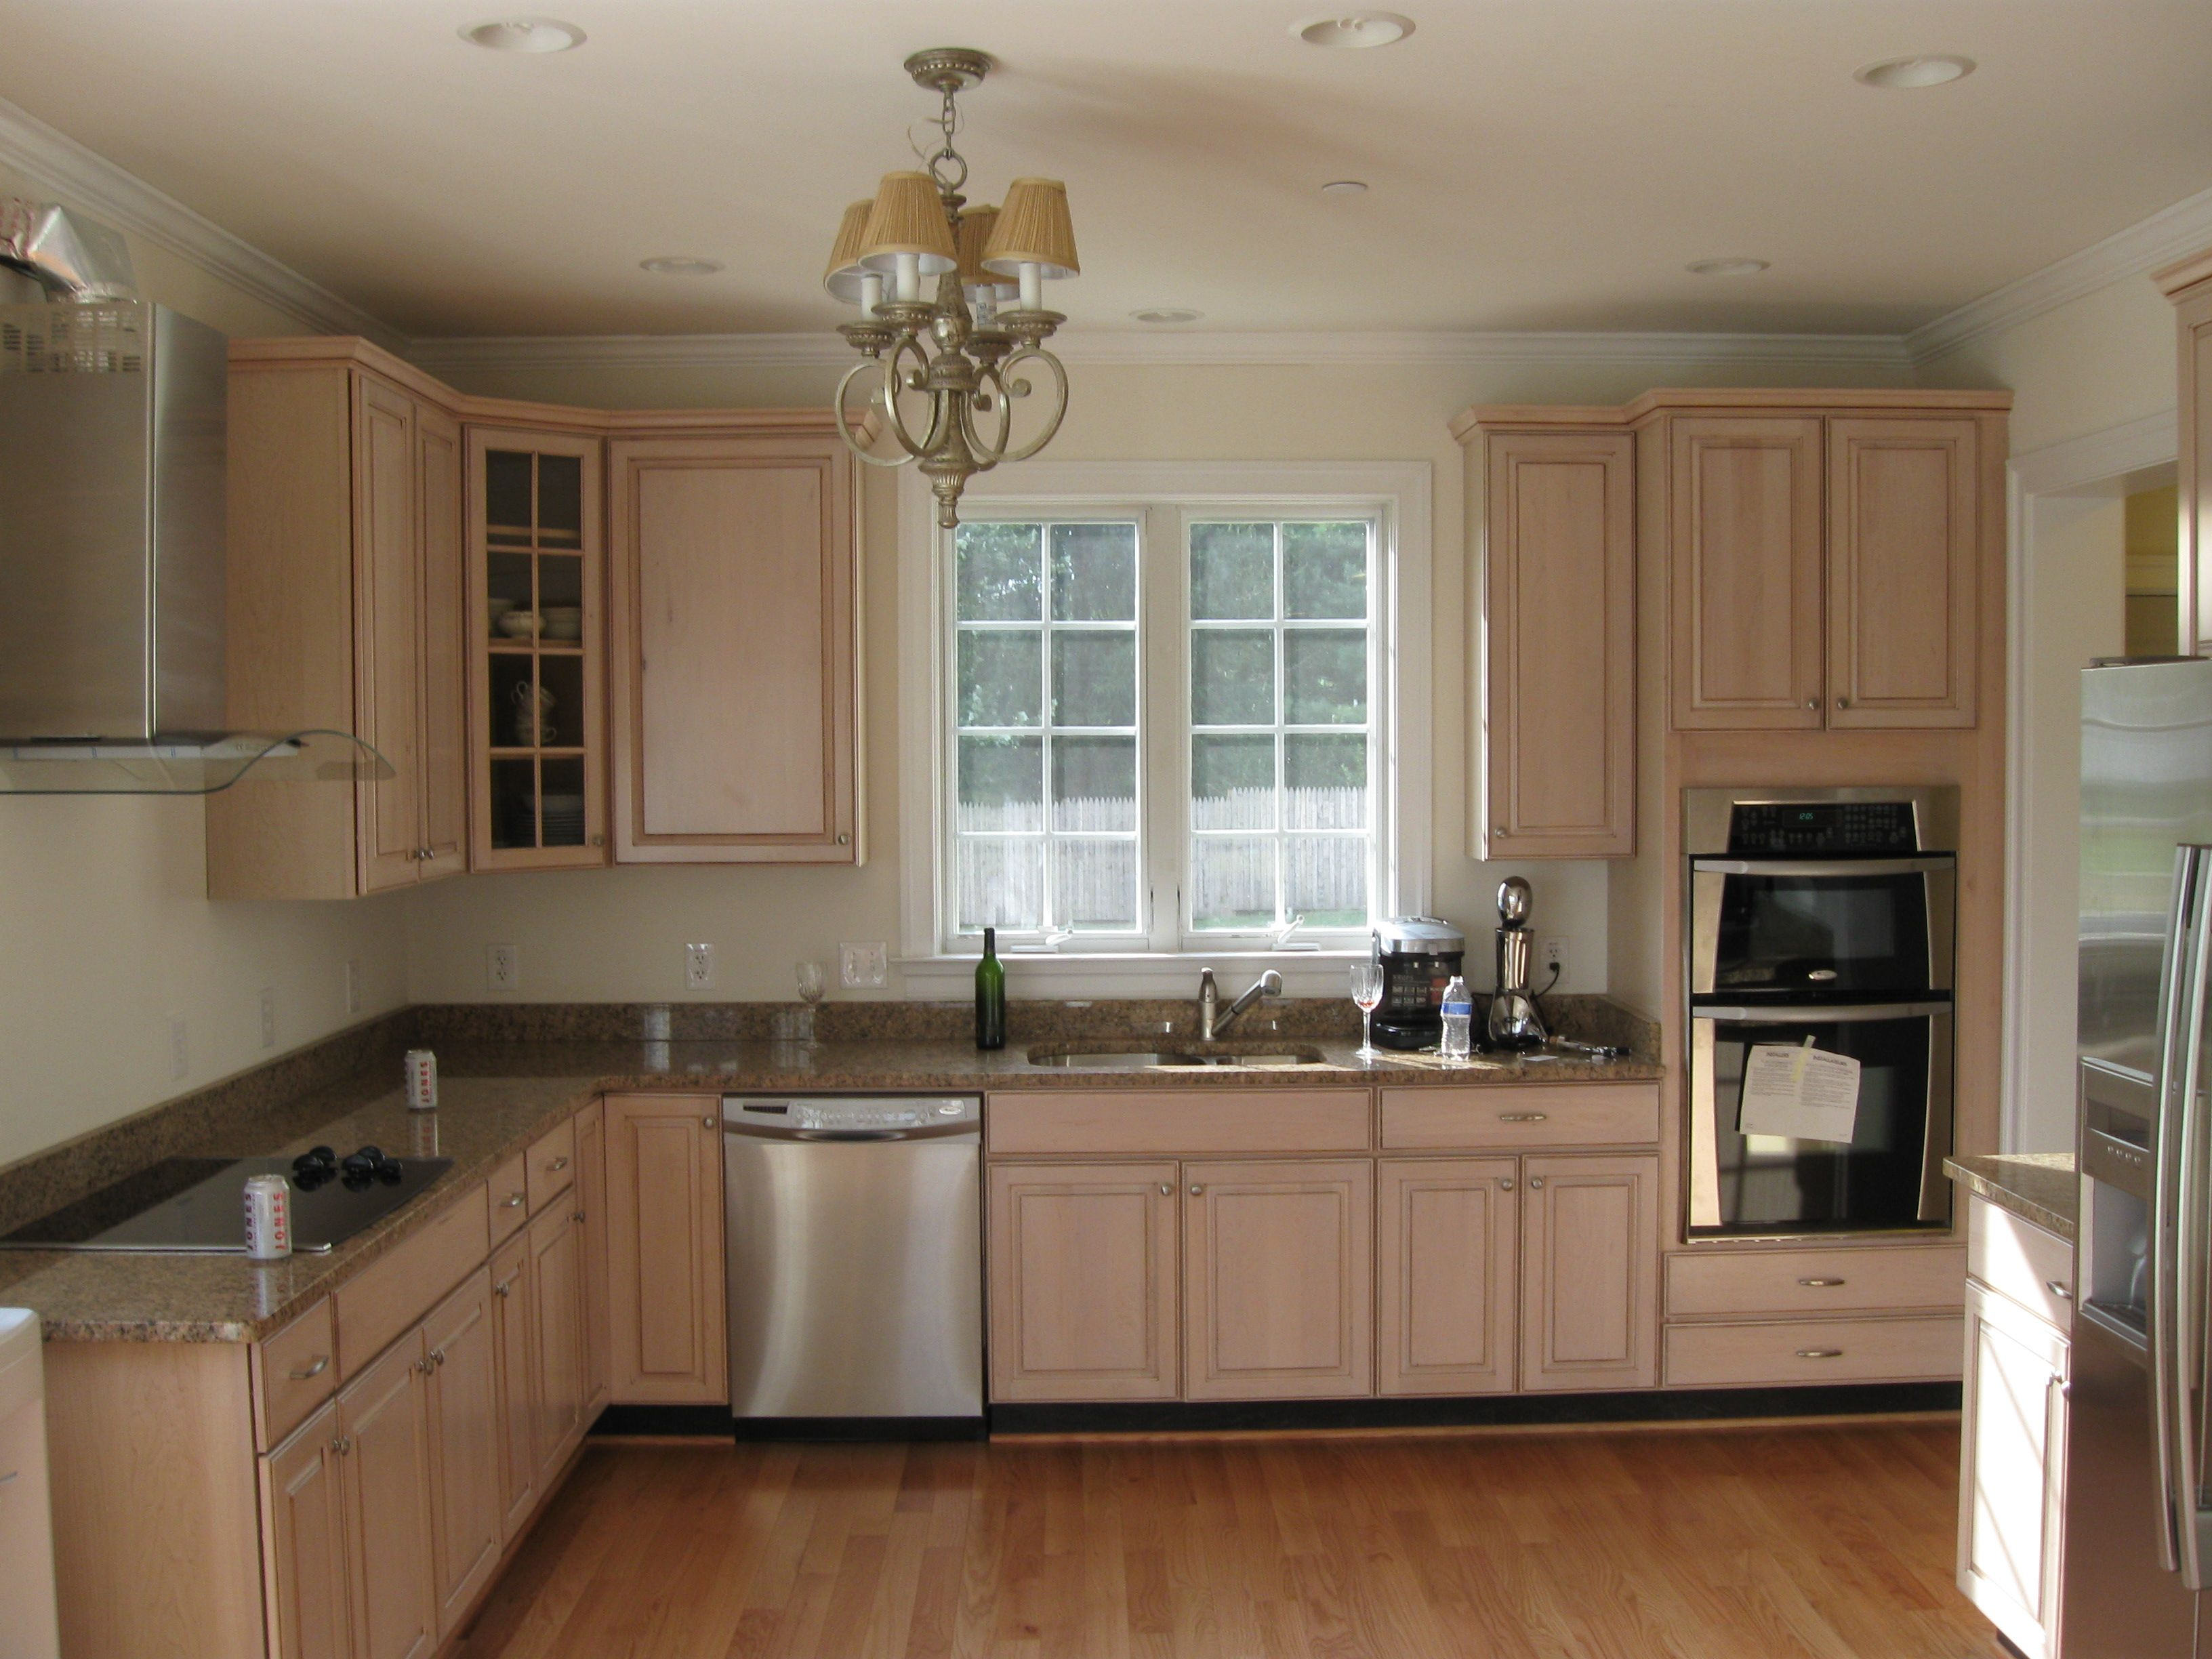 New Era Modular Homes North American Series Kitchen Merillat